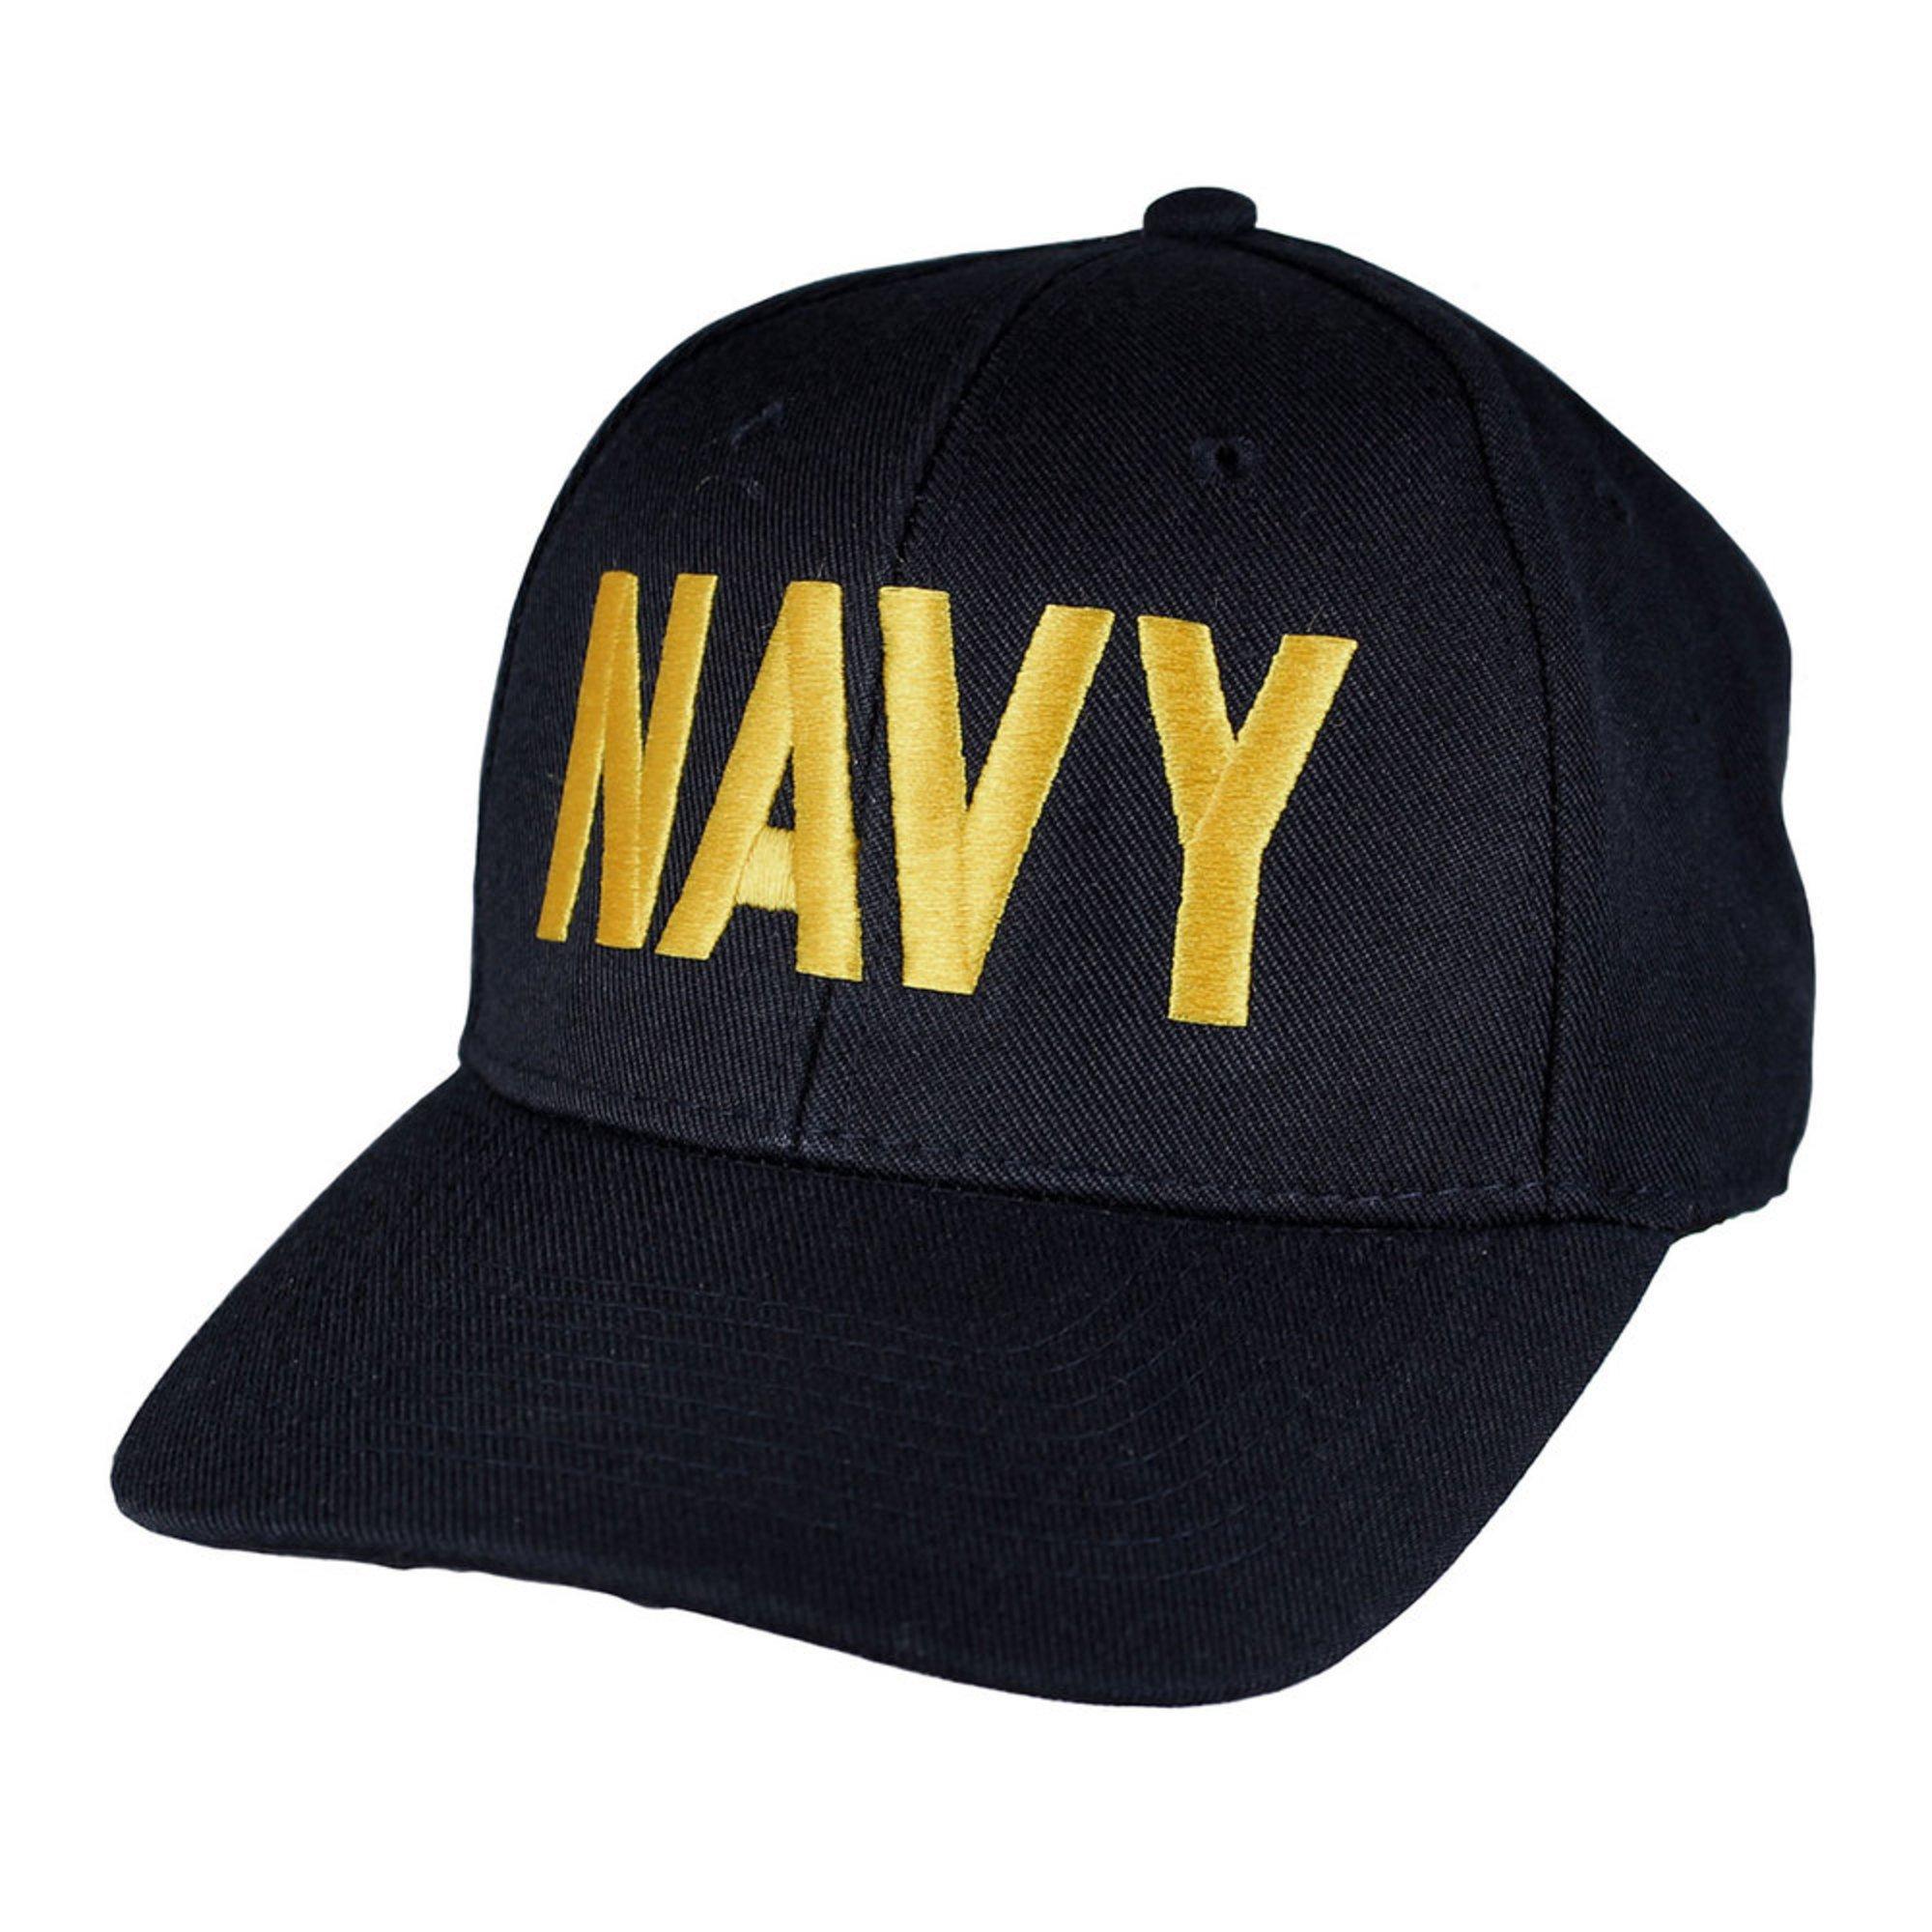 6e2d9e9e719 Eagle Crest Wool Velcro Hat In Navy